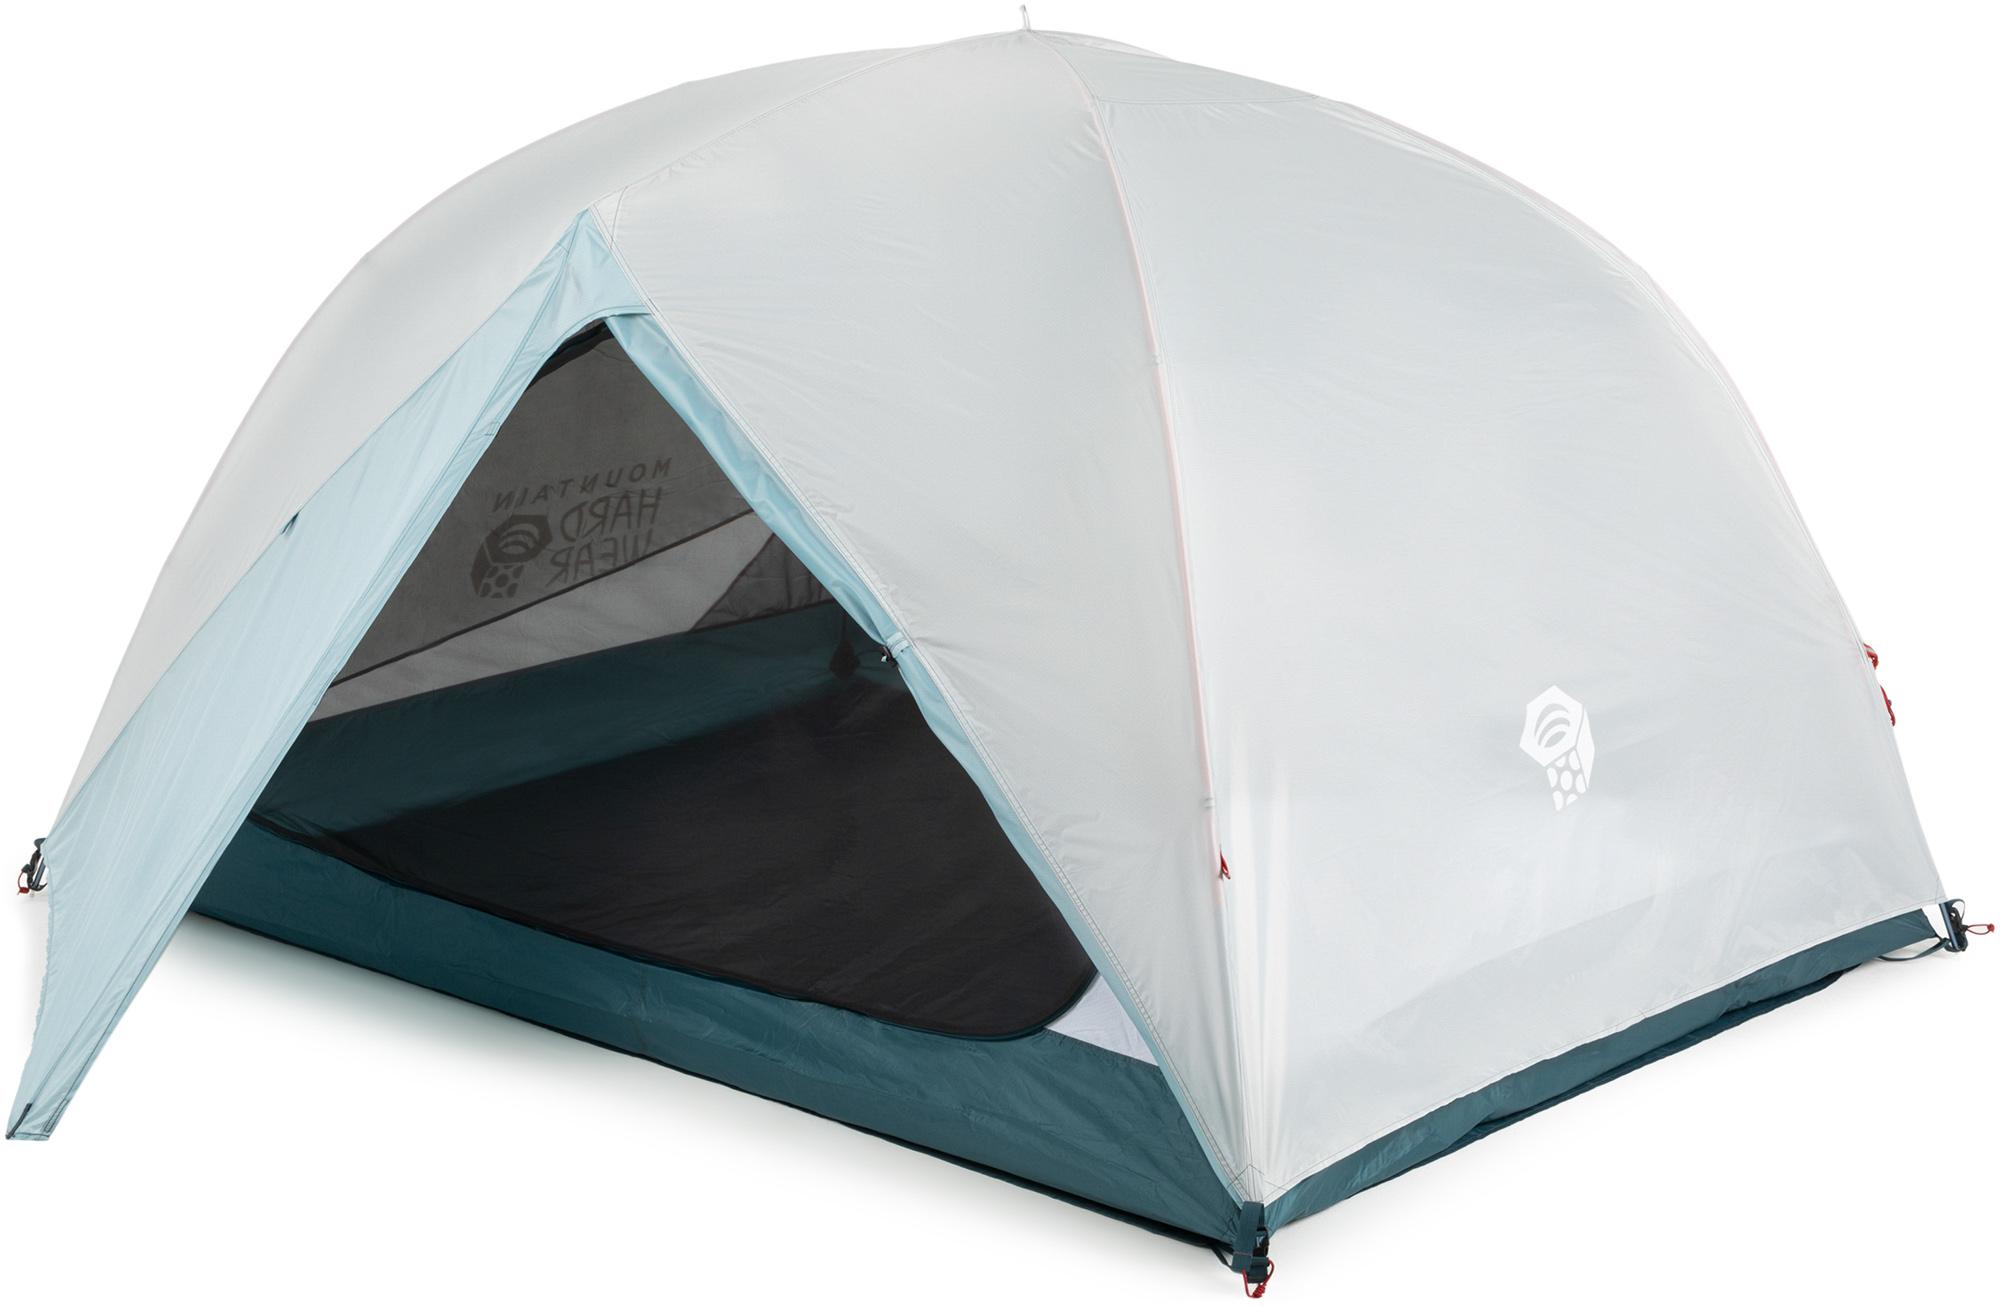 Фото - Mountain Hardwear Палатка 3-местная Mountain Hardwear Mineral King 3 палатка greenhouse fct 32 трехместная